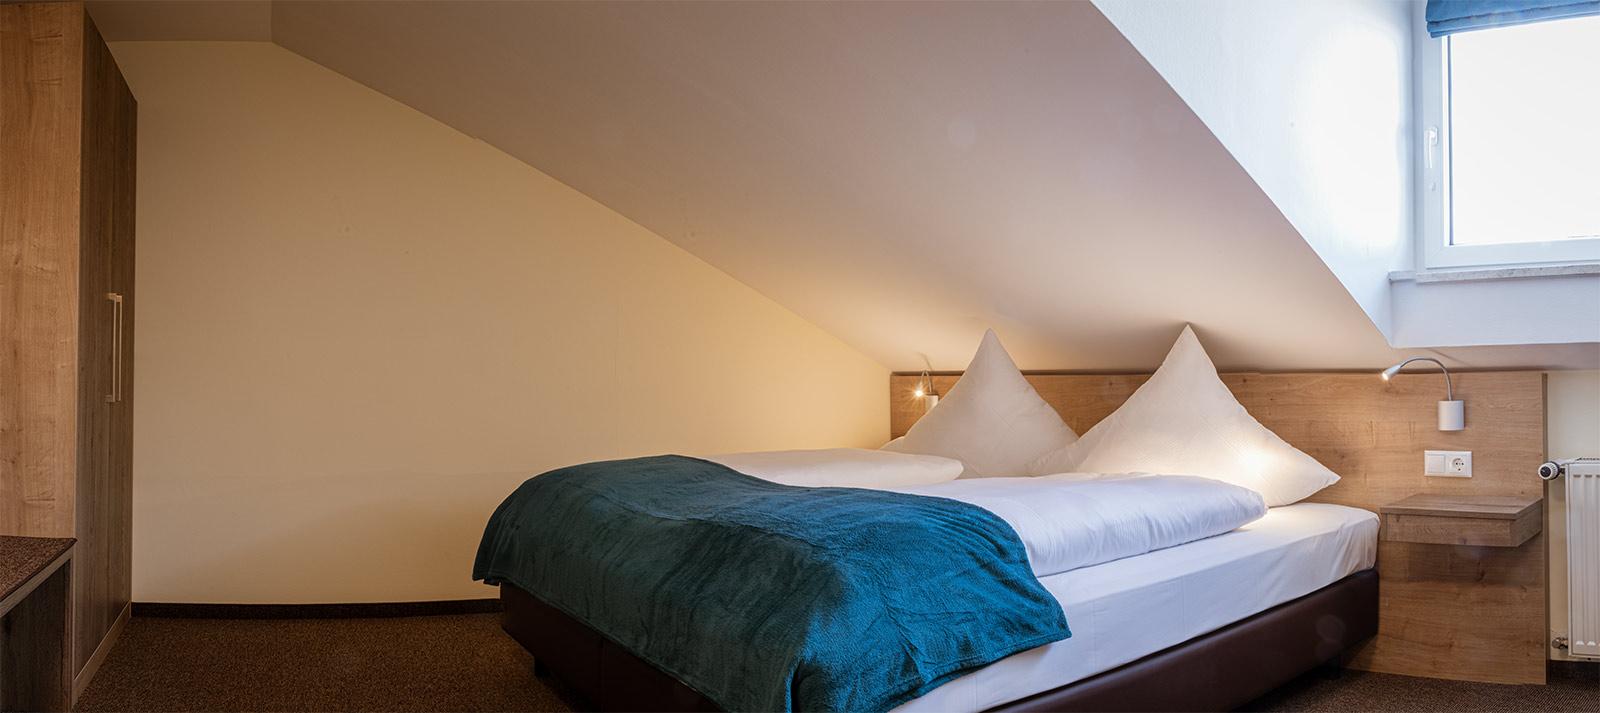 Doppelzimmer Landshut